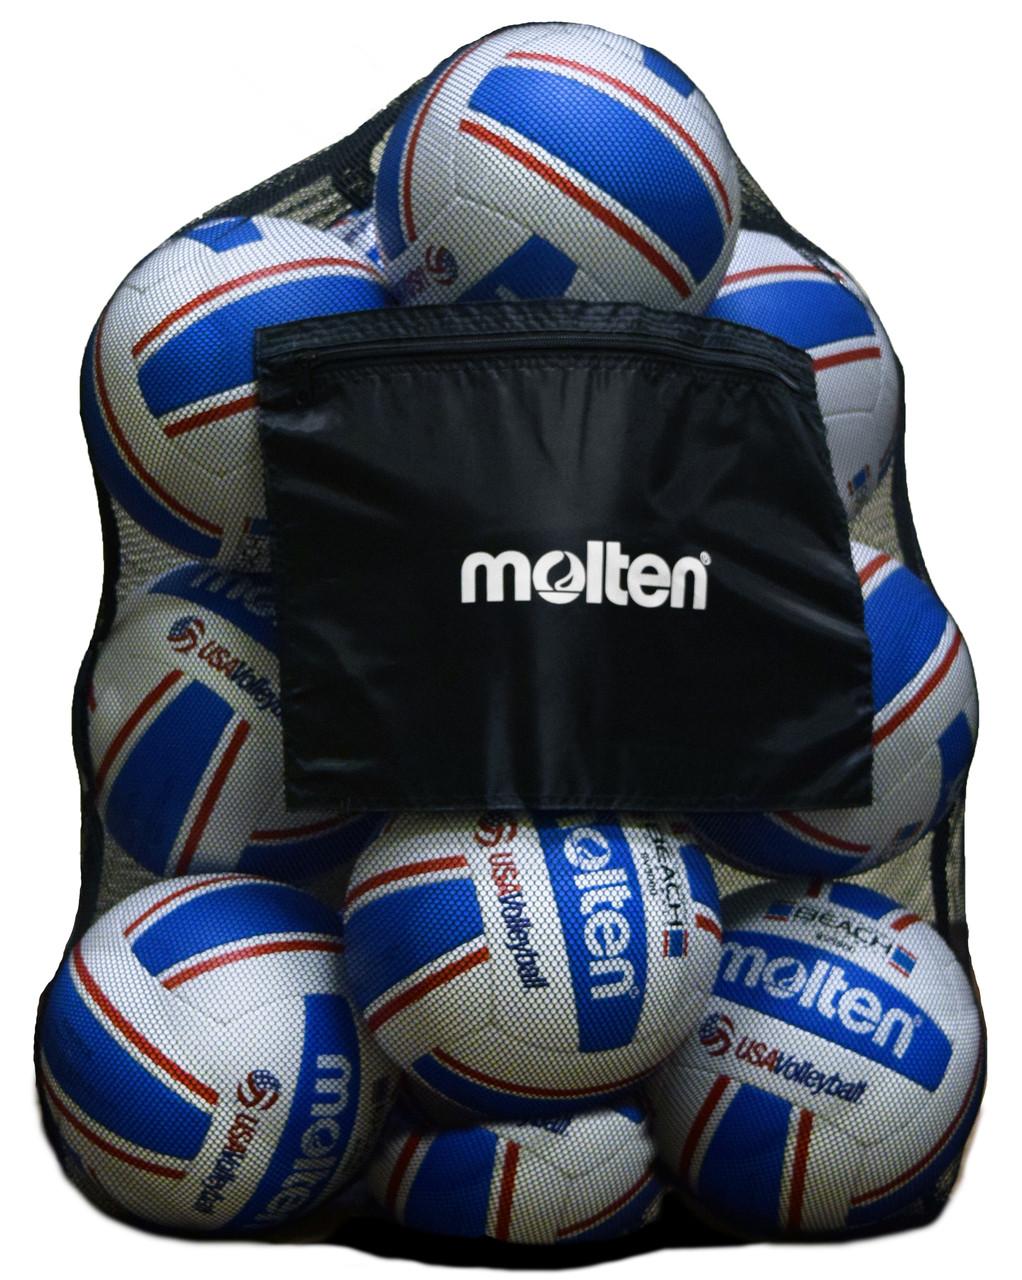 008c88f37 Mesh Ball Bag | Sports Equipment | Molten USA